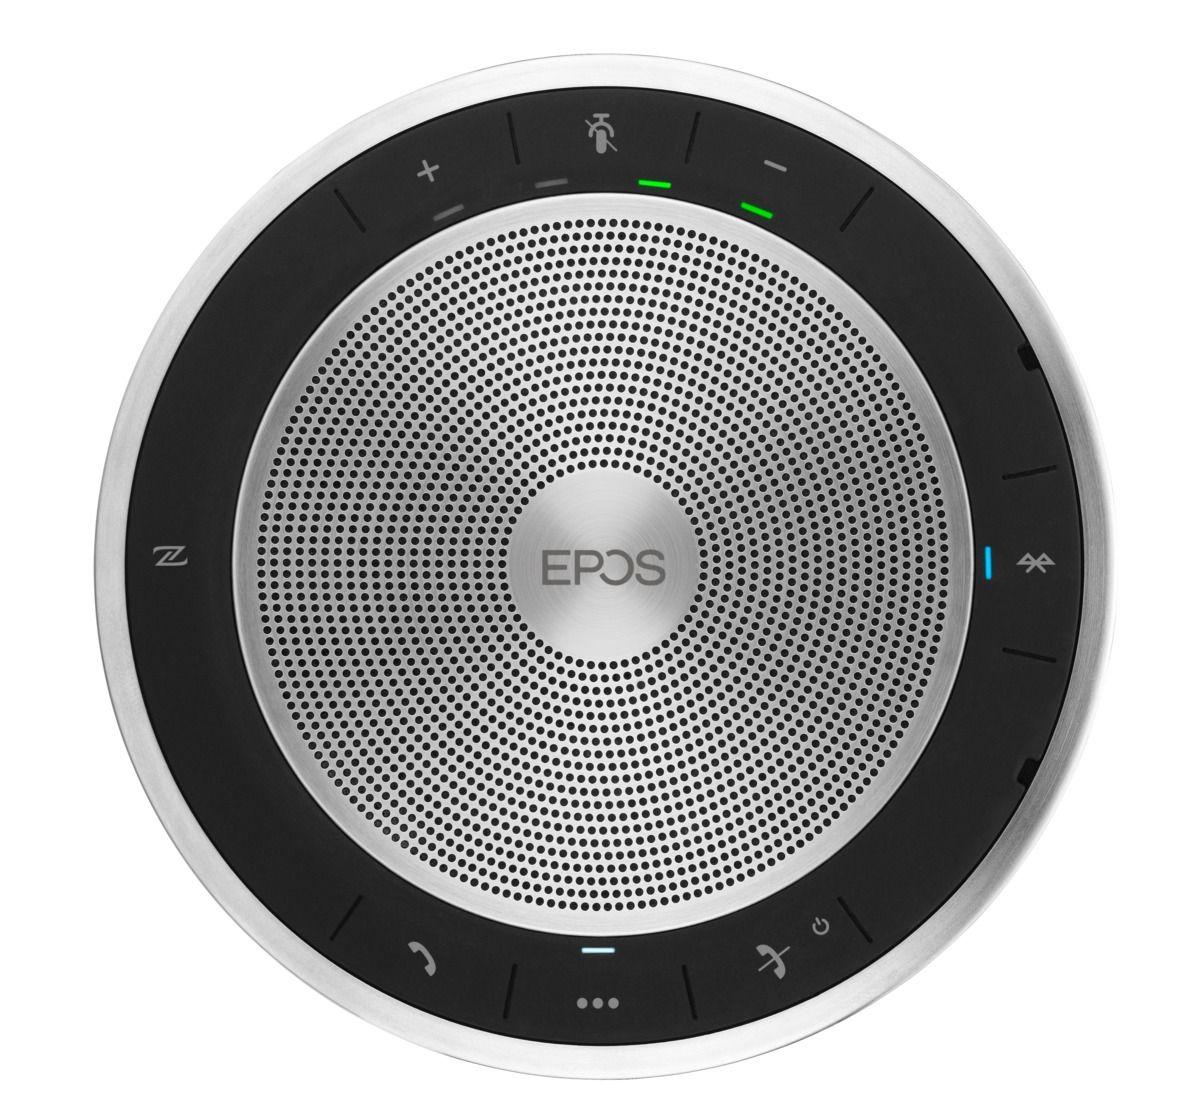 Epos Expand SP 30 Speakerphone